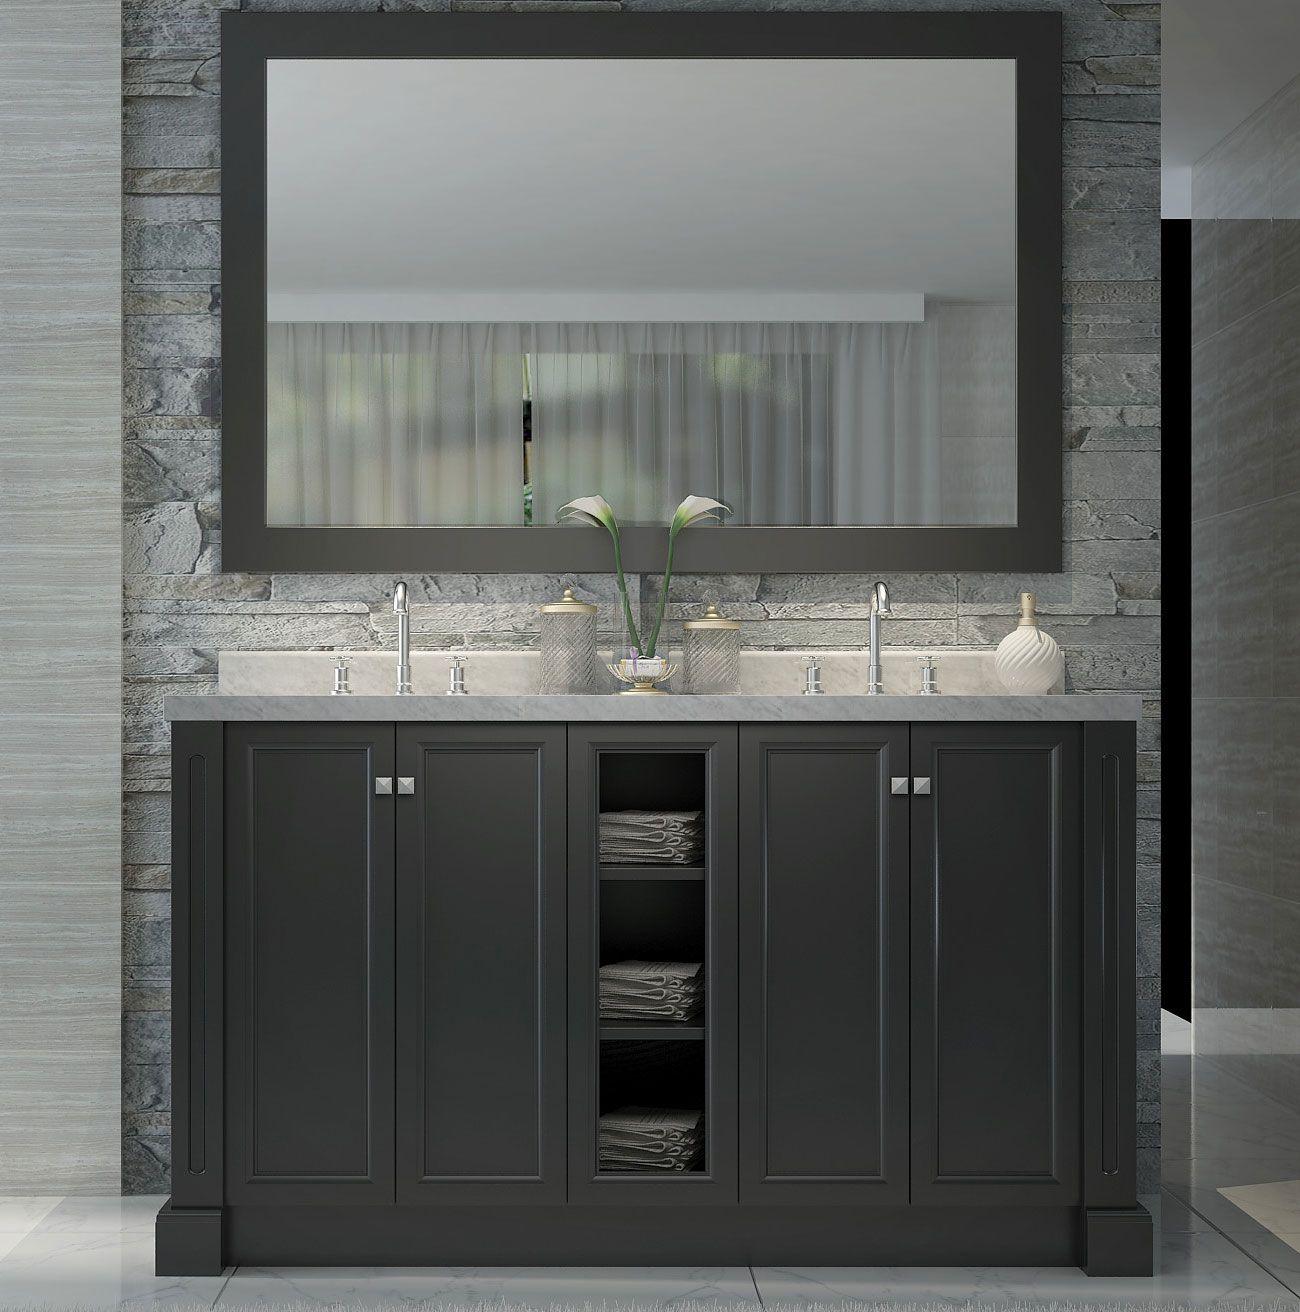 Westwood 60 Inch Double Sink Bath Vanity Black Finish Jpg 1 300 312 Pixels